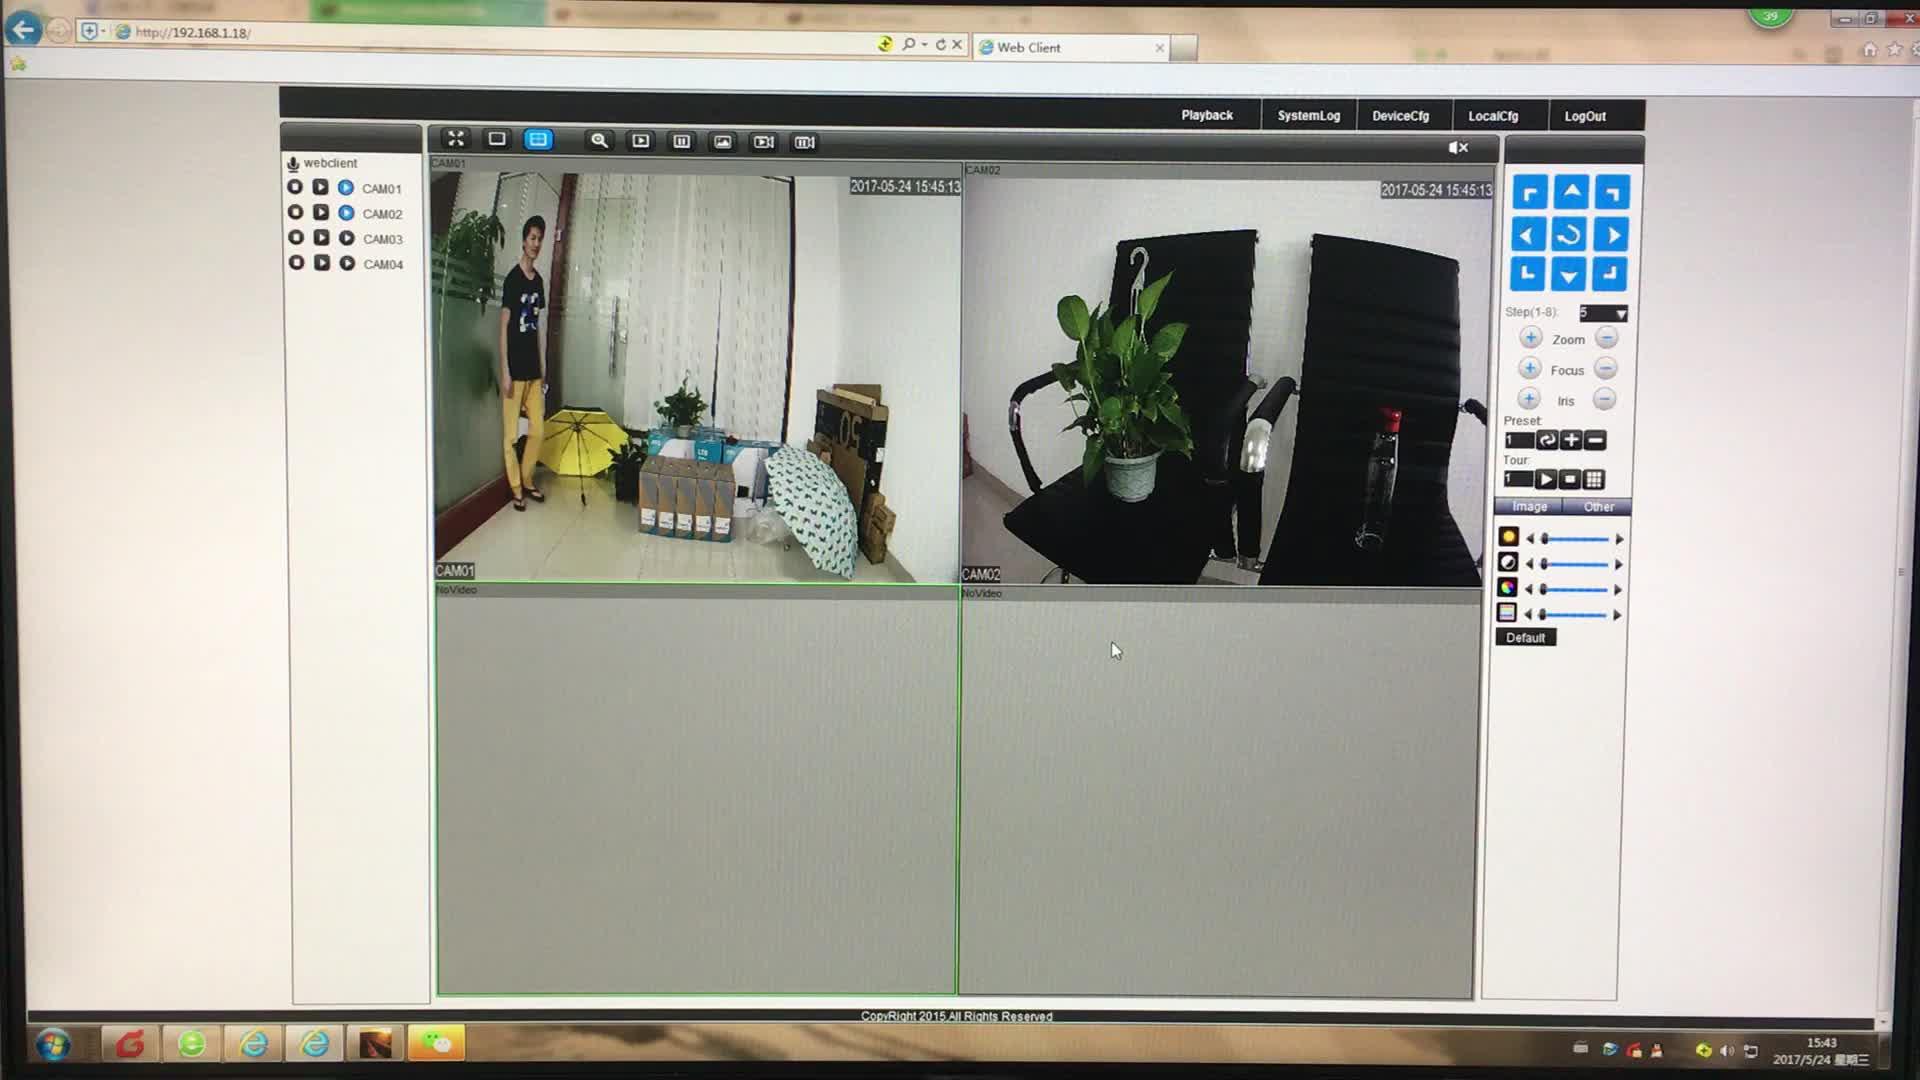 Unicon 비전 하이브리드 보안 CCTV 감시 4CH 달리 Dvr의 시간 264 독립형 Dvr 1080 마력